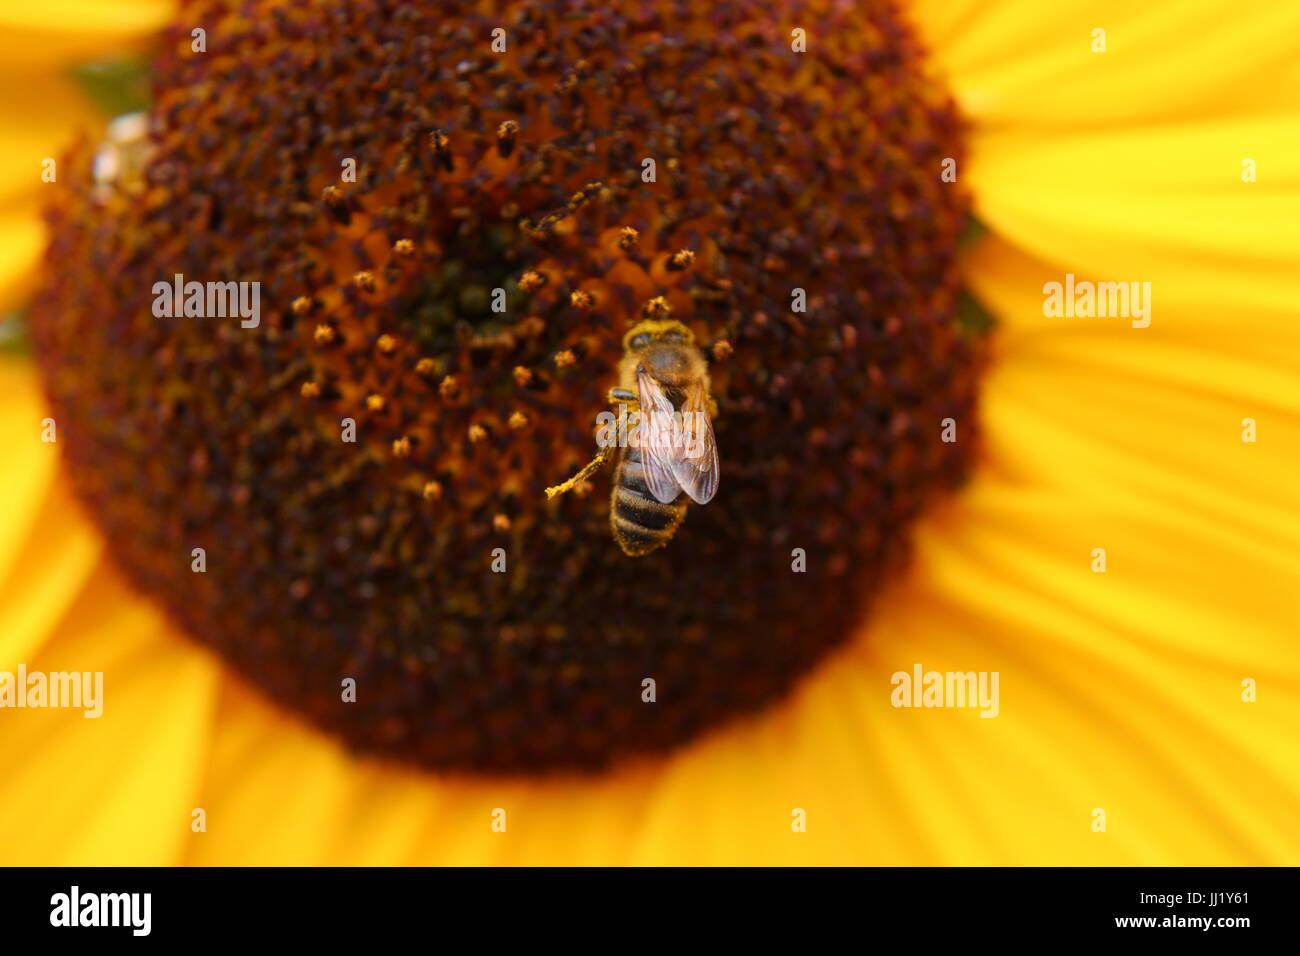 Wasp Feeding on Sun Flower - Stock Image